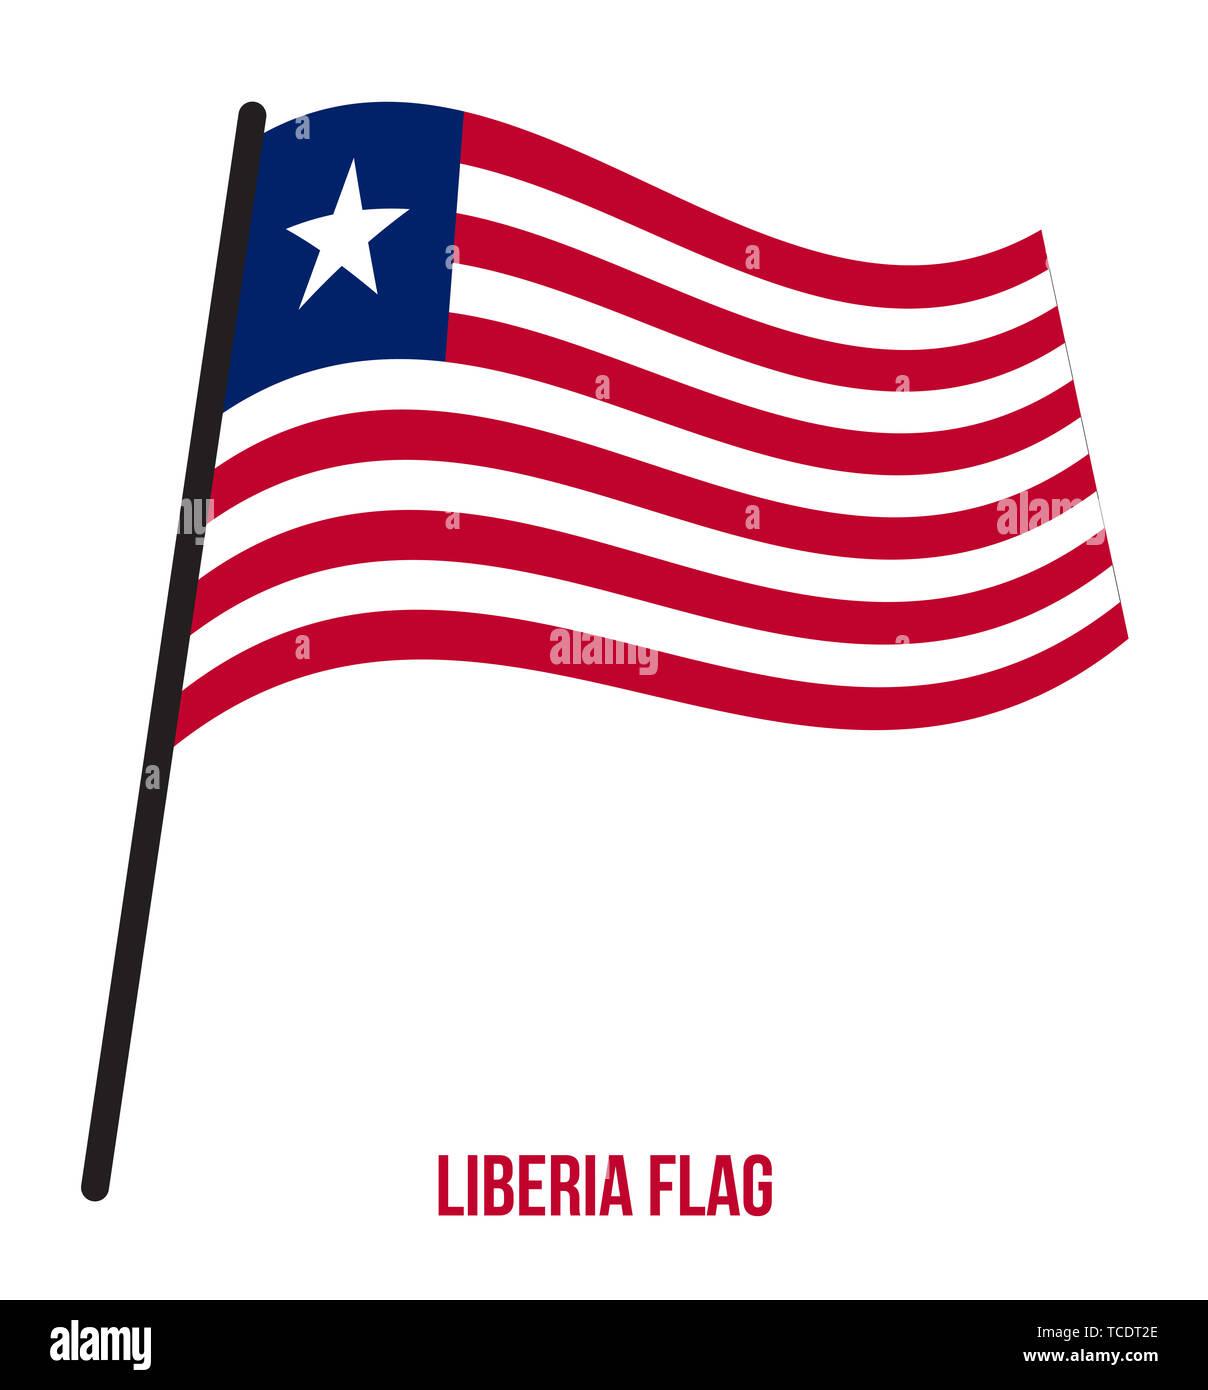 Liberia Flag Waving Vector Illustration on White Background. Liberia National Flag. - Stock Image